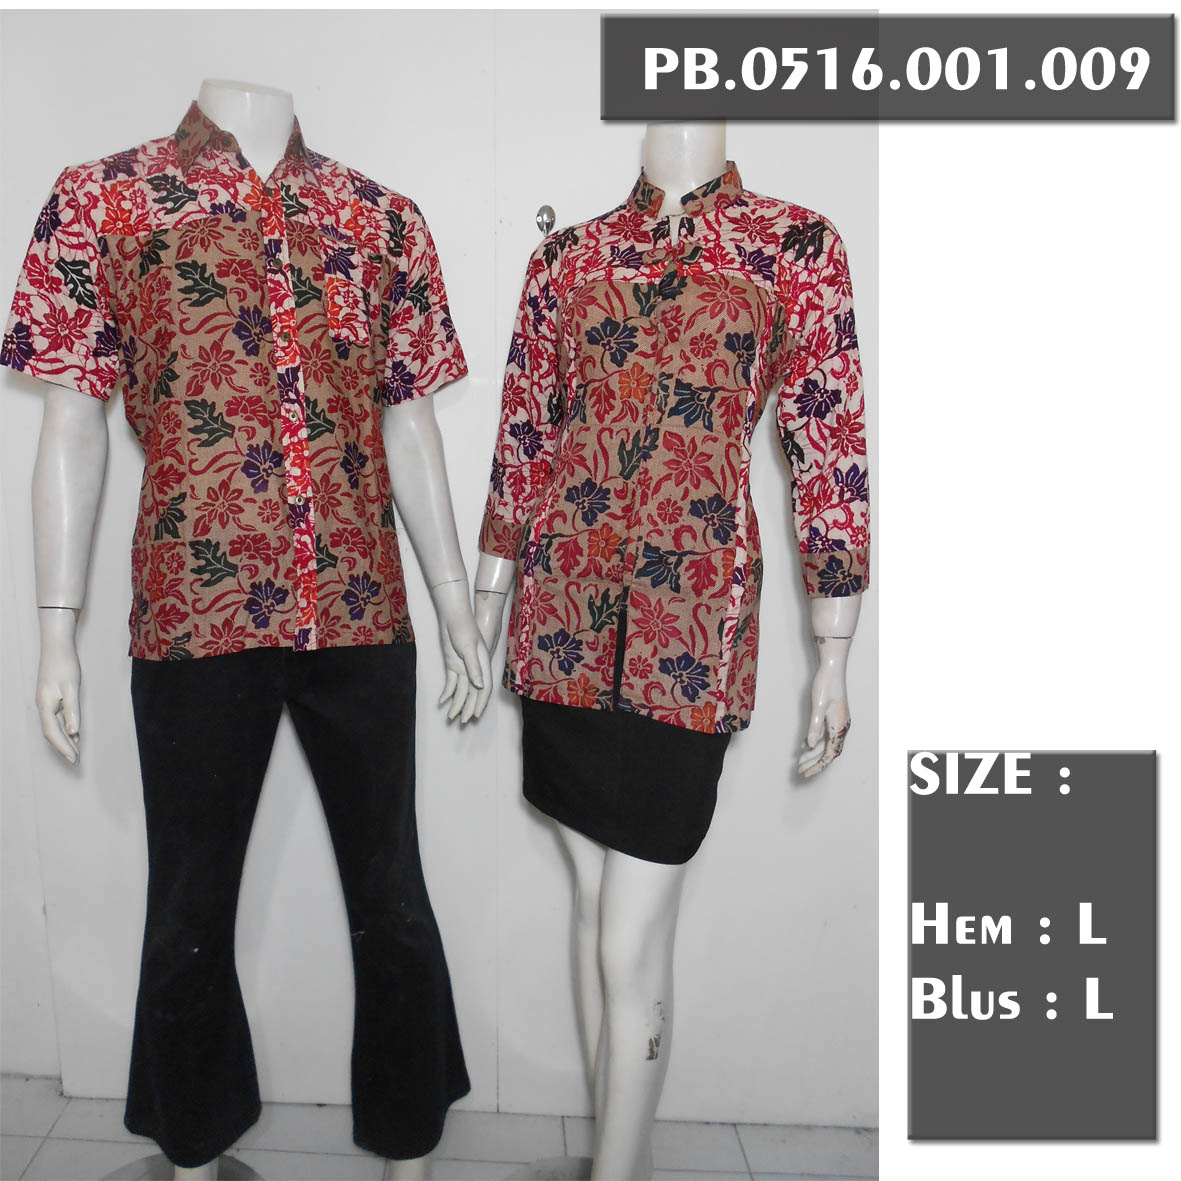 Jual Pasangan Blus Batik Lengan 7 8 Couple Batik Sarimbit